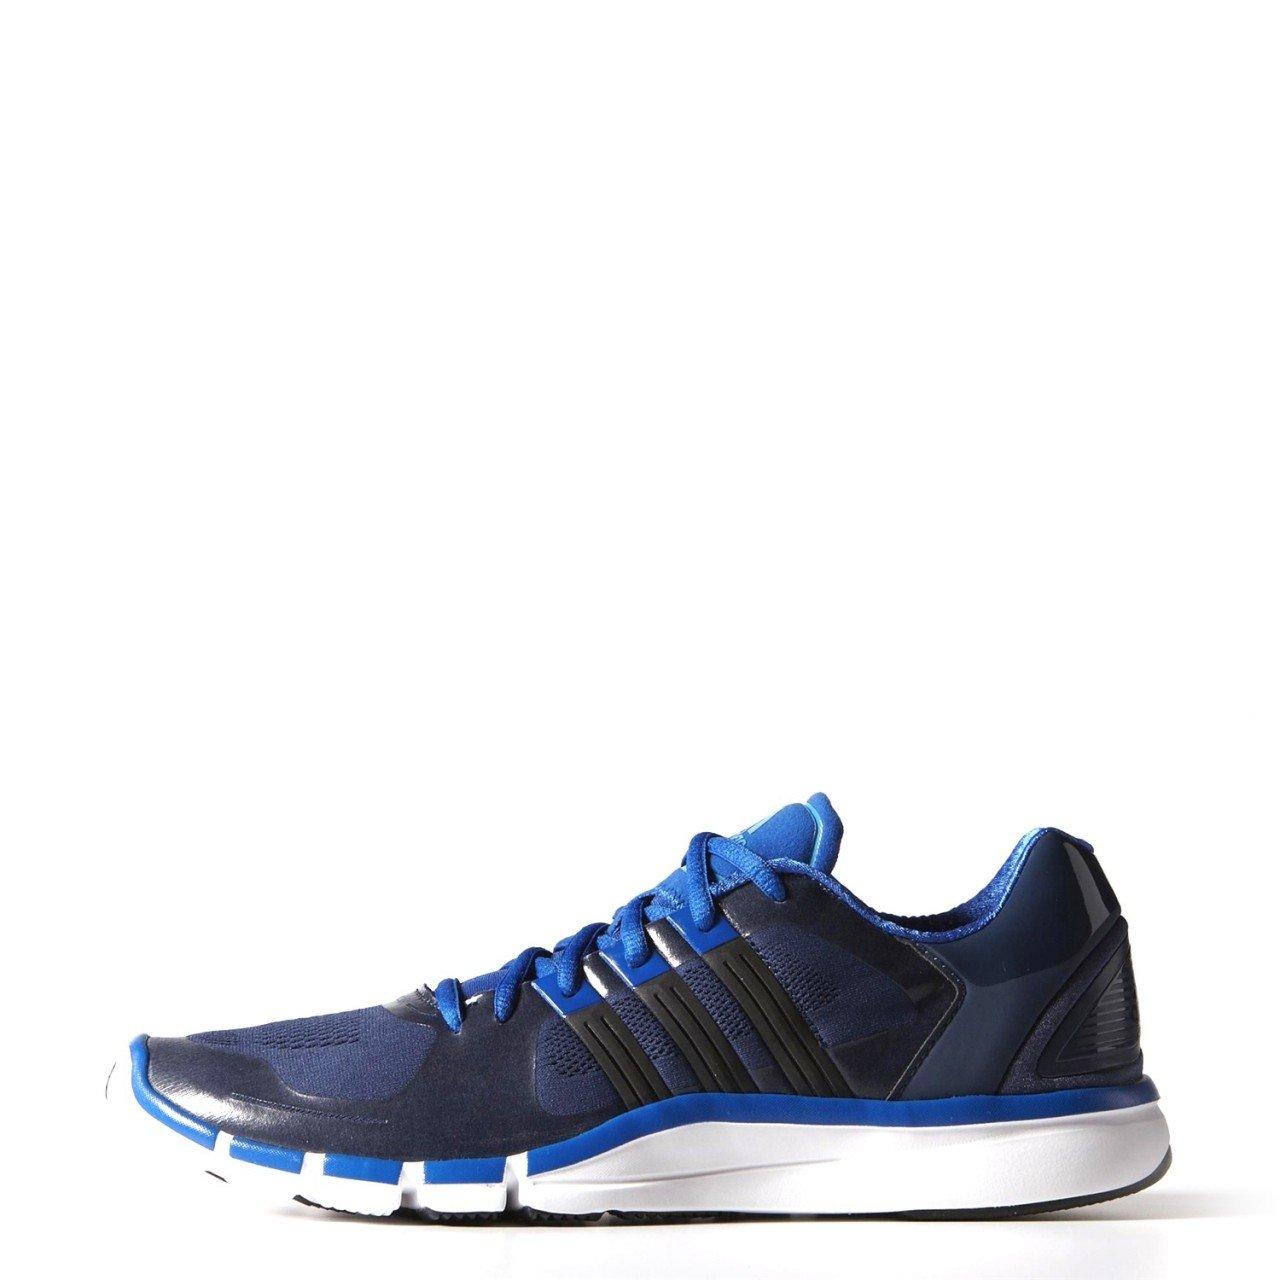 Adidas M18107 - Zapatos Polideportivas Al Aire Libre para Hombre 48 EU Bleu